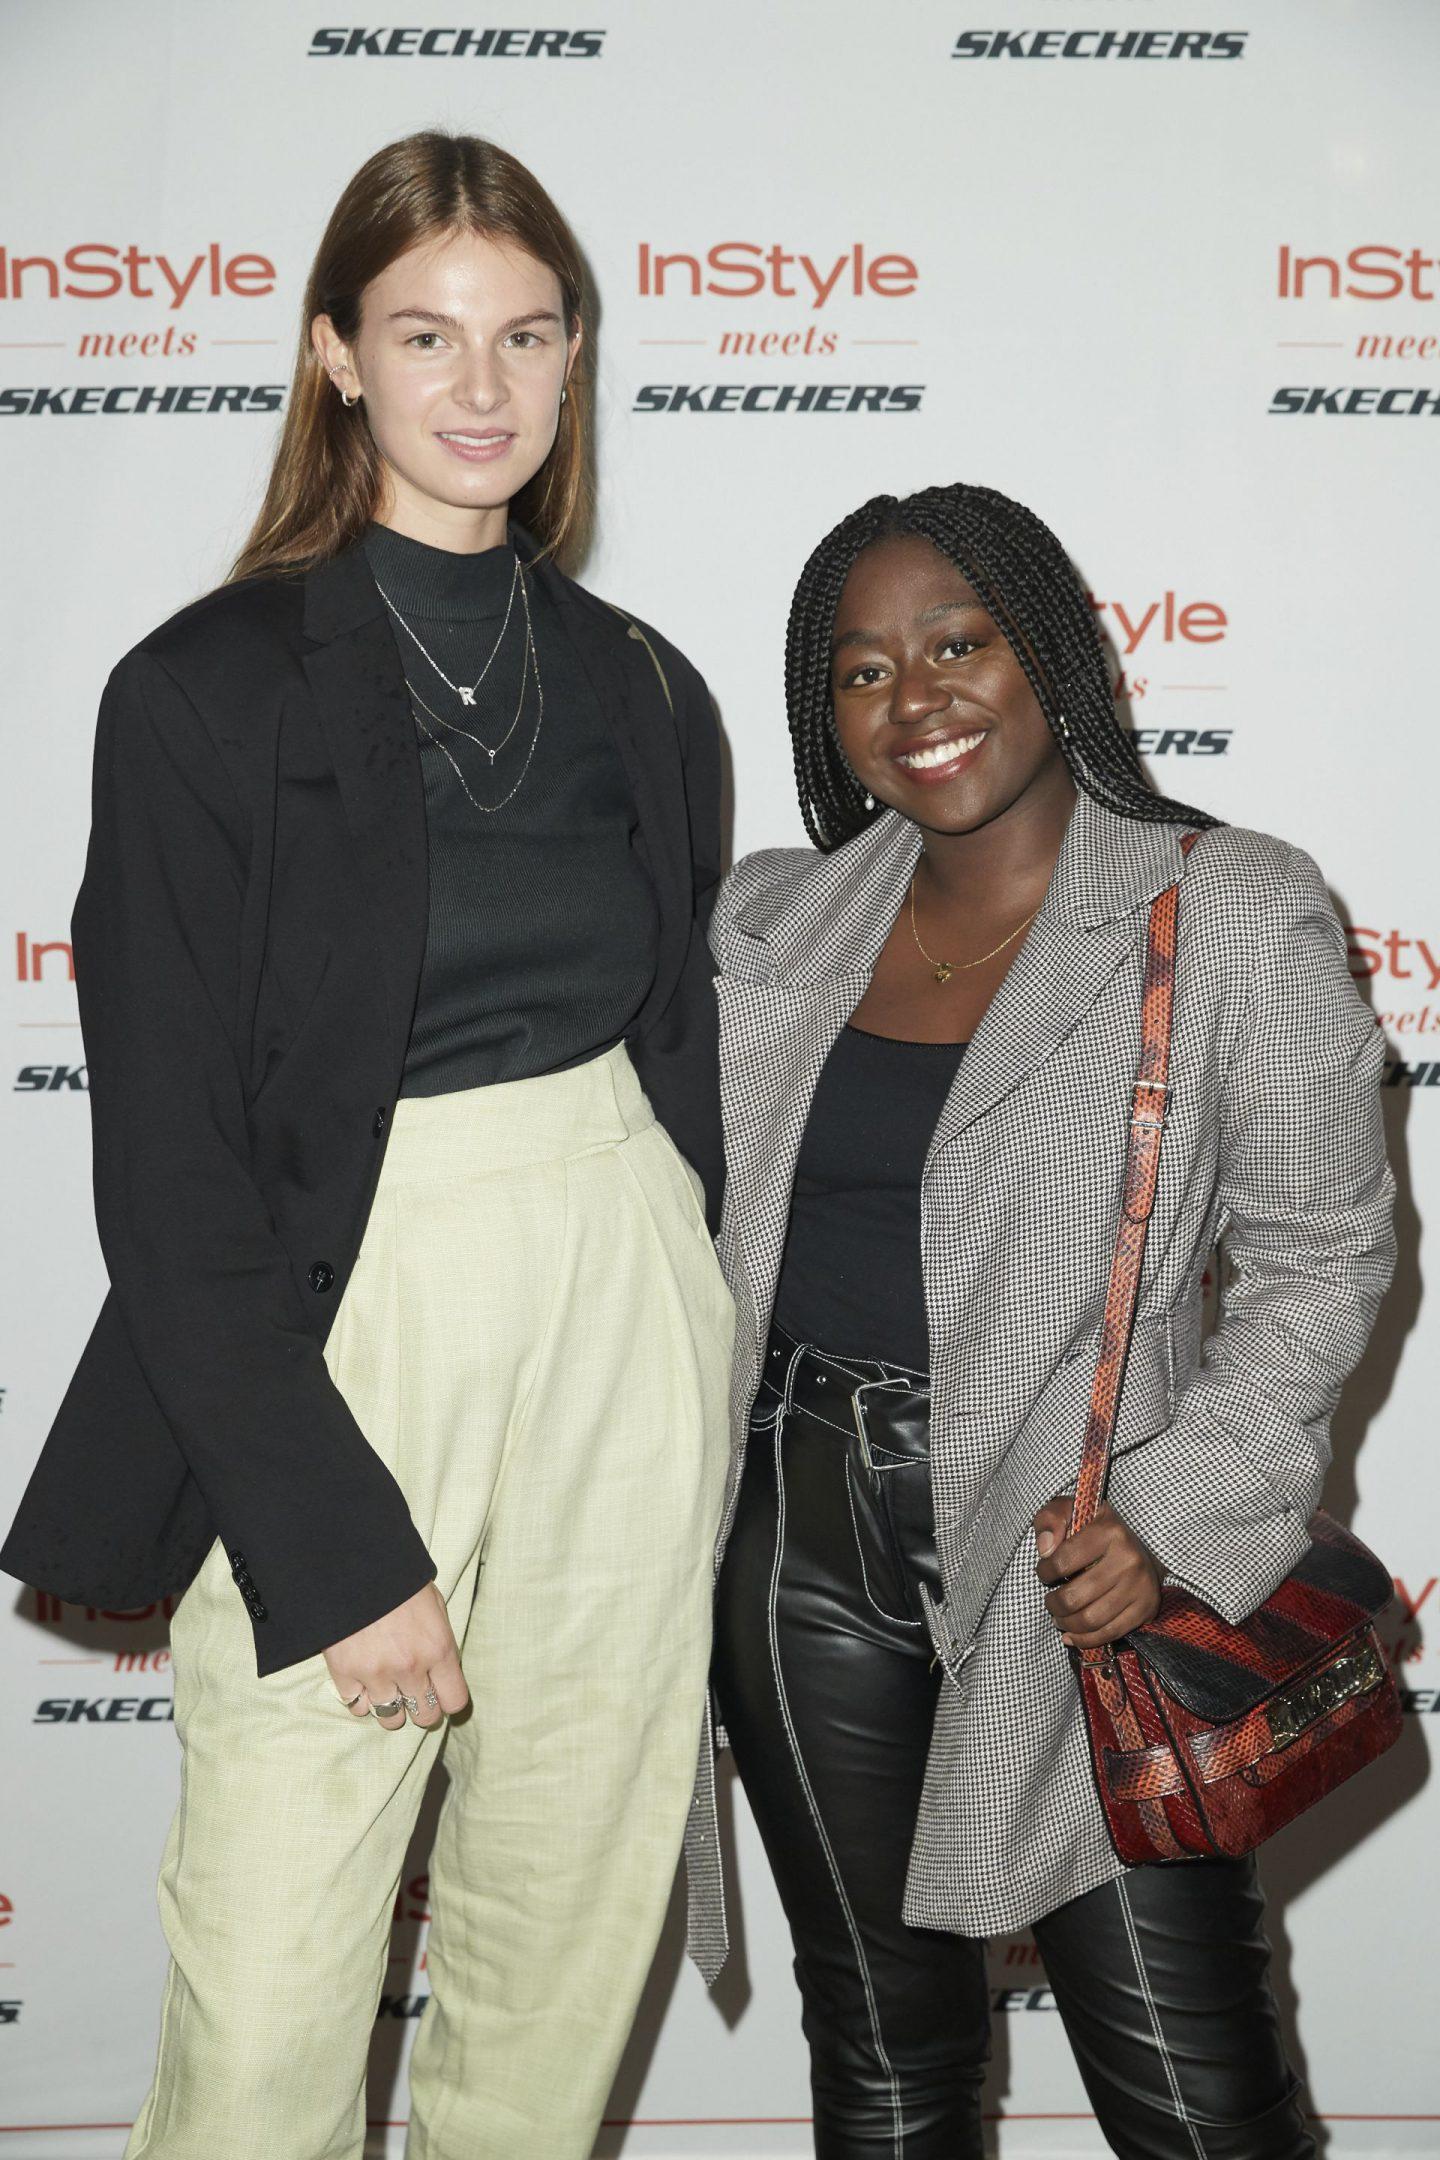 Instyle meets Skechers Jacqueline Zelwis und Lois Opoku